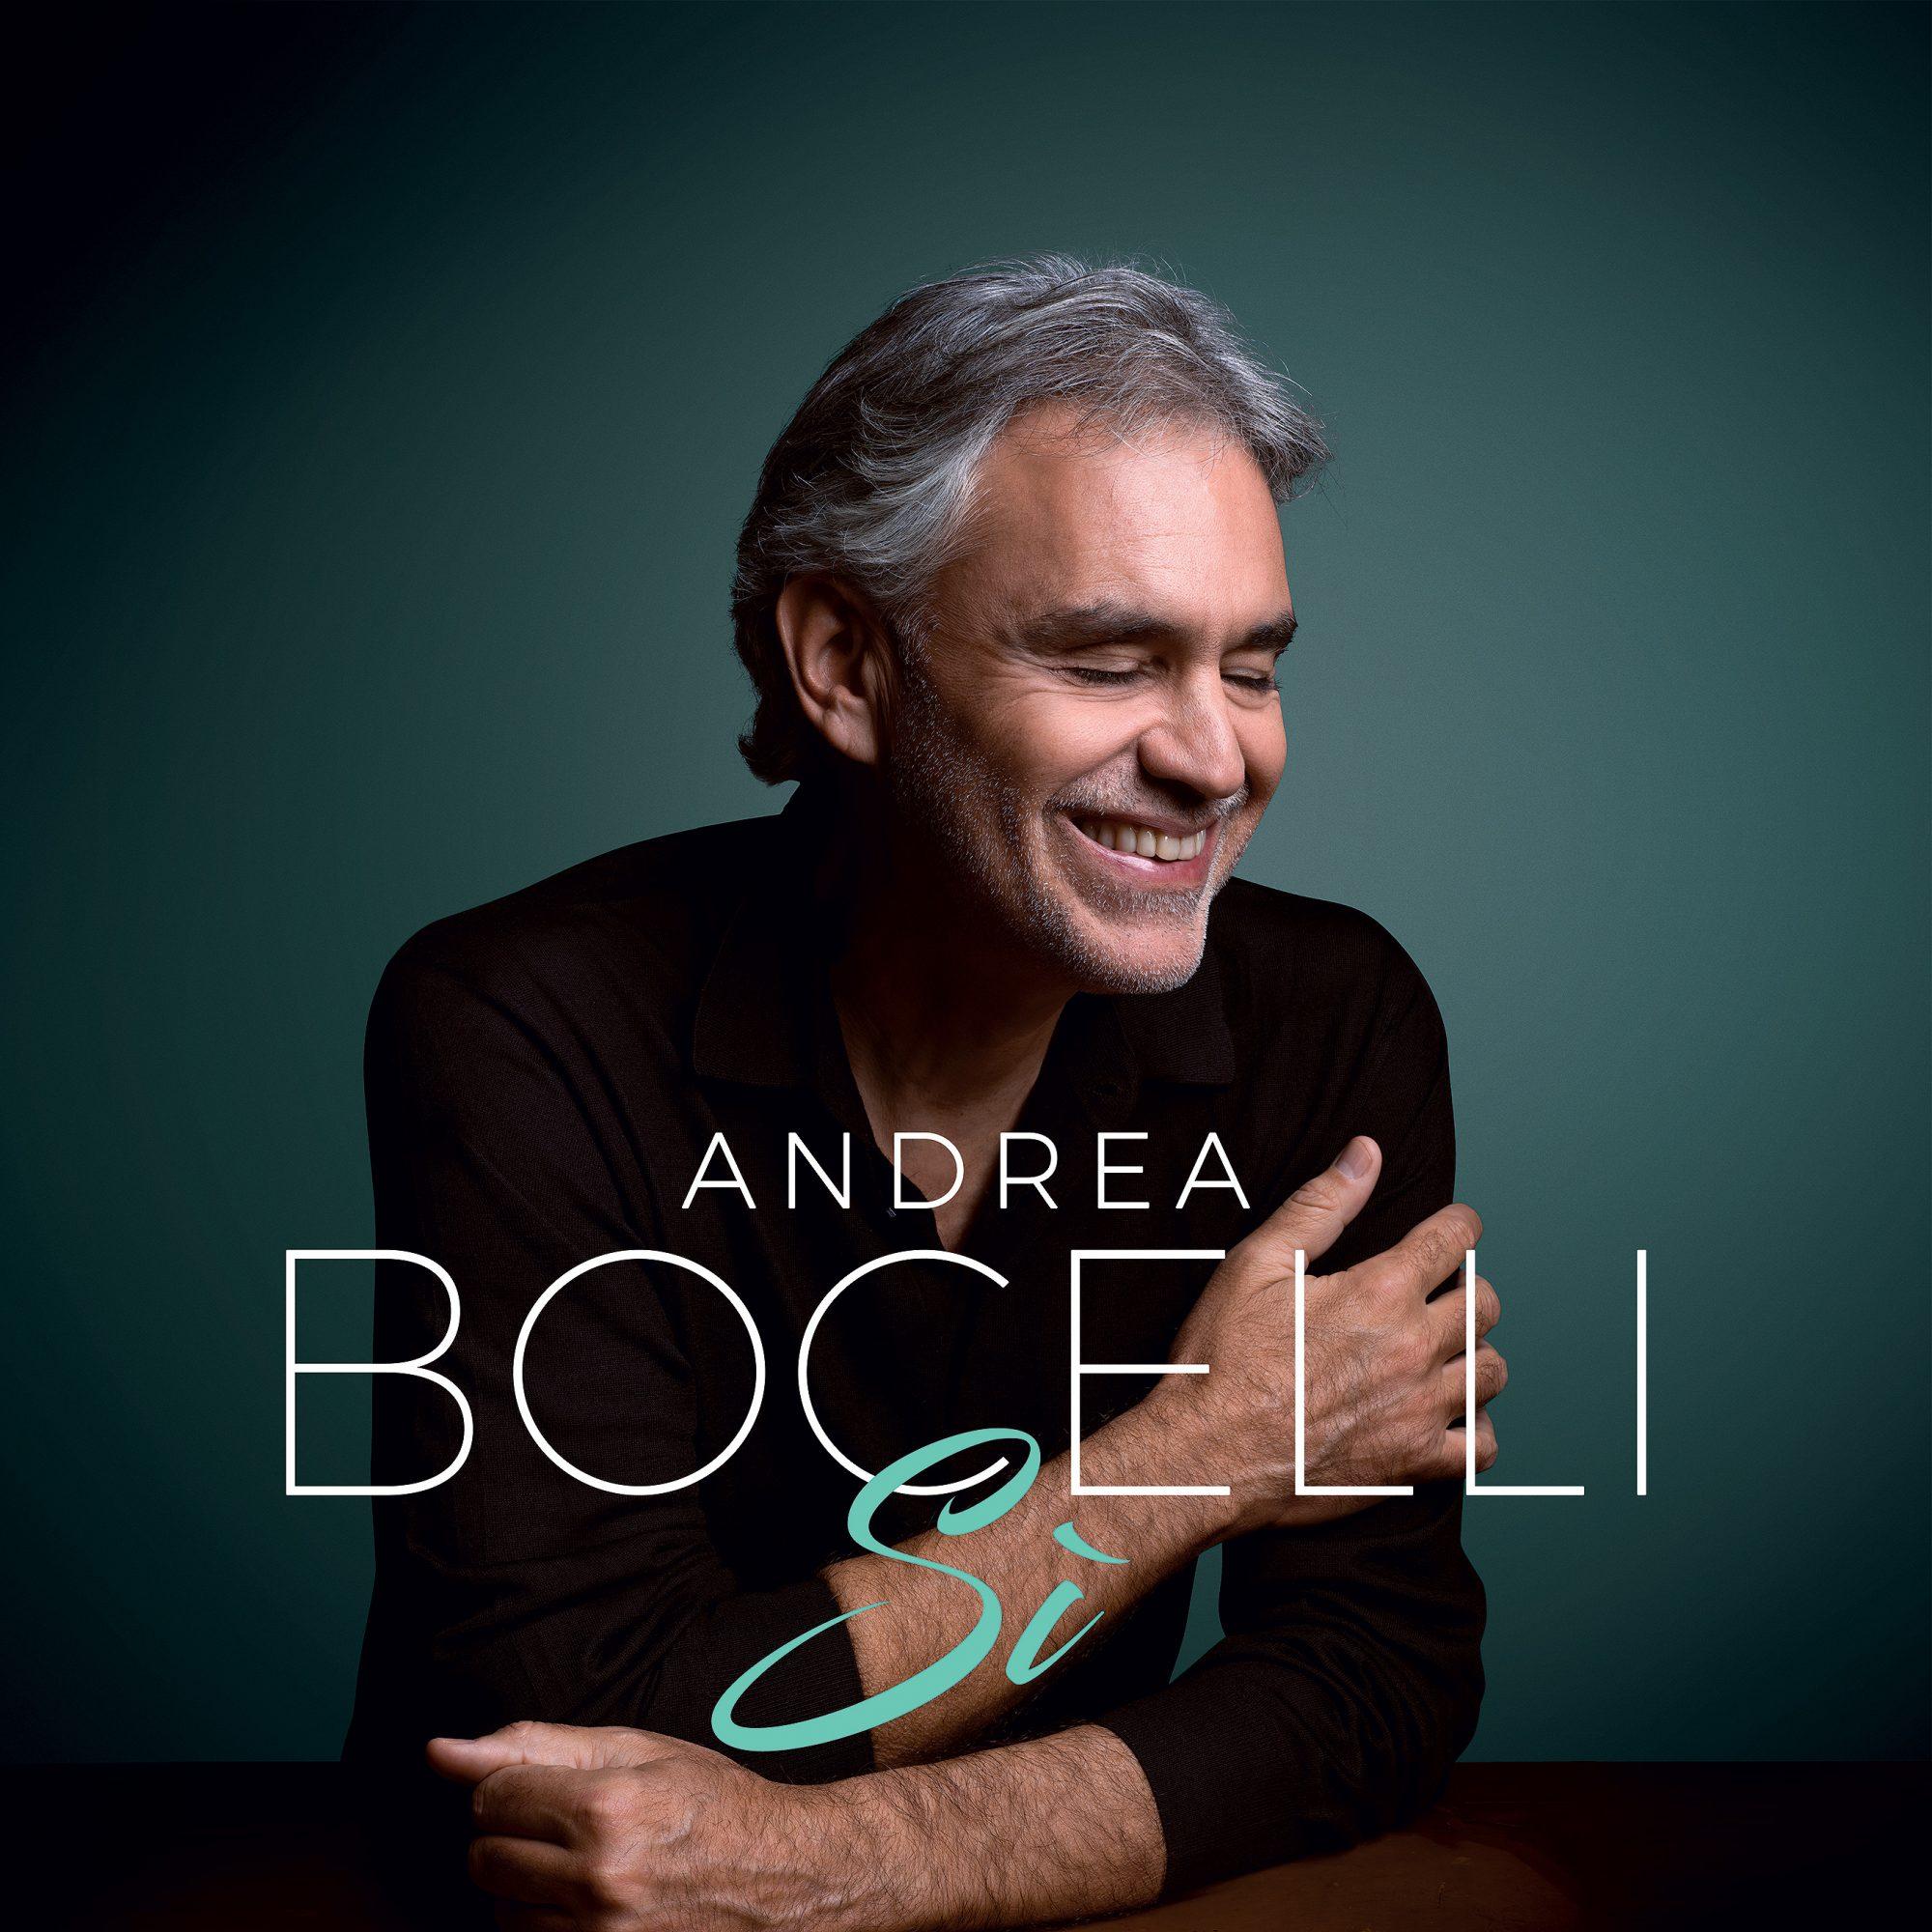 Andrea BocelliCredit: Universal